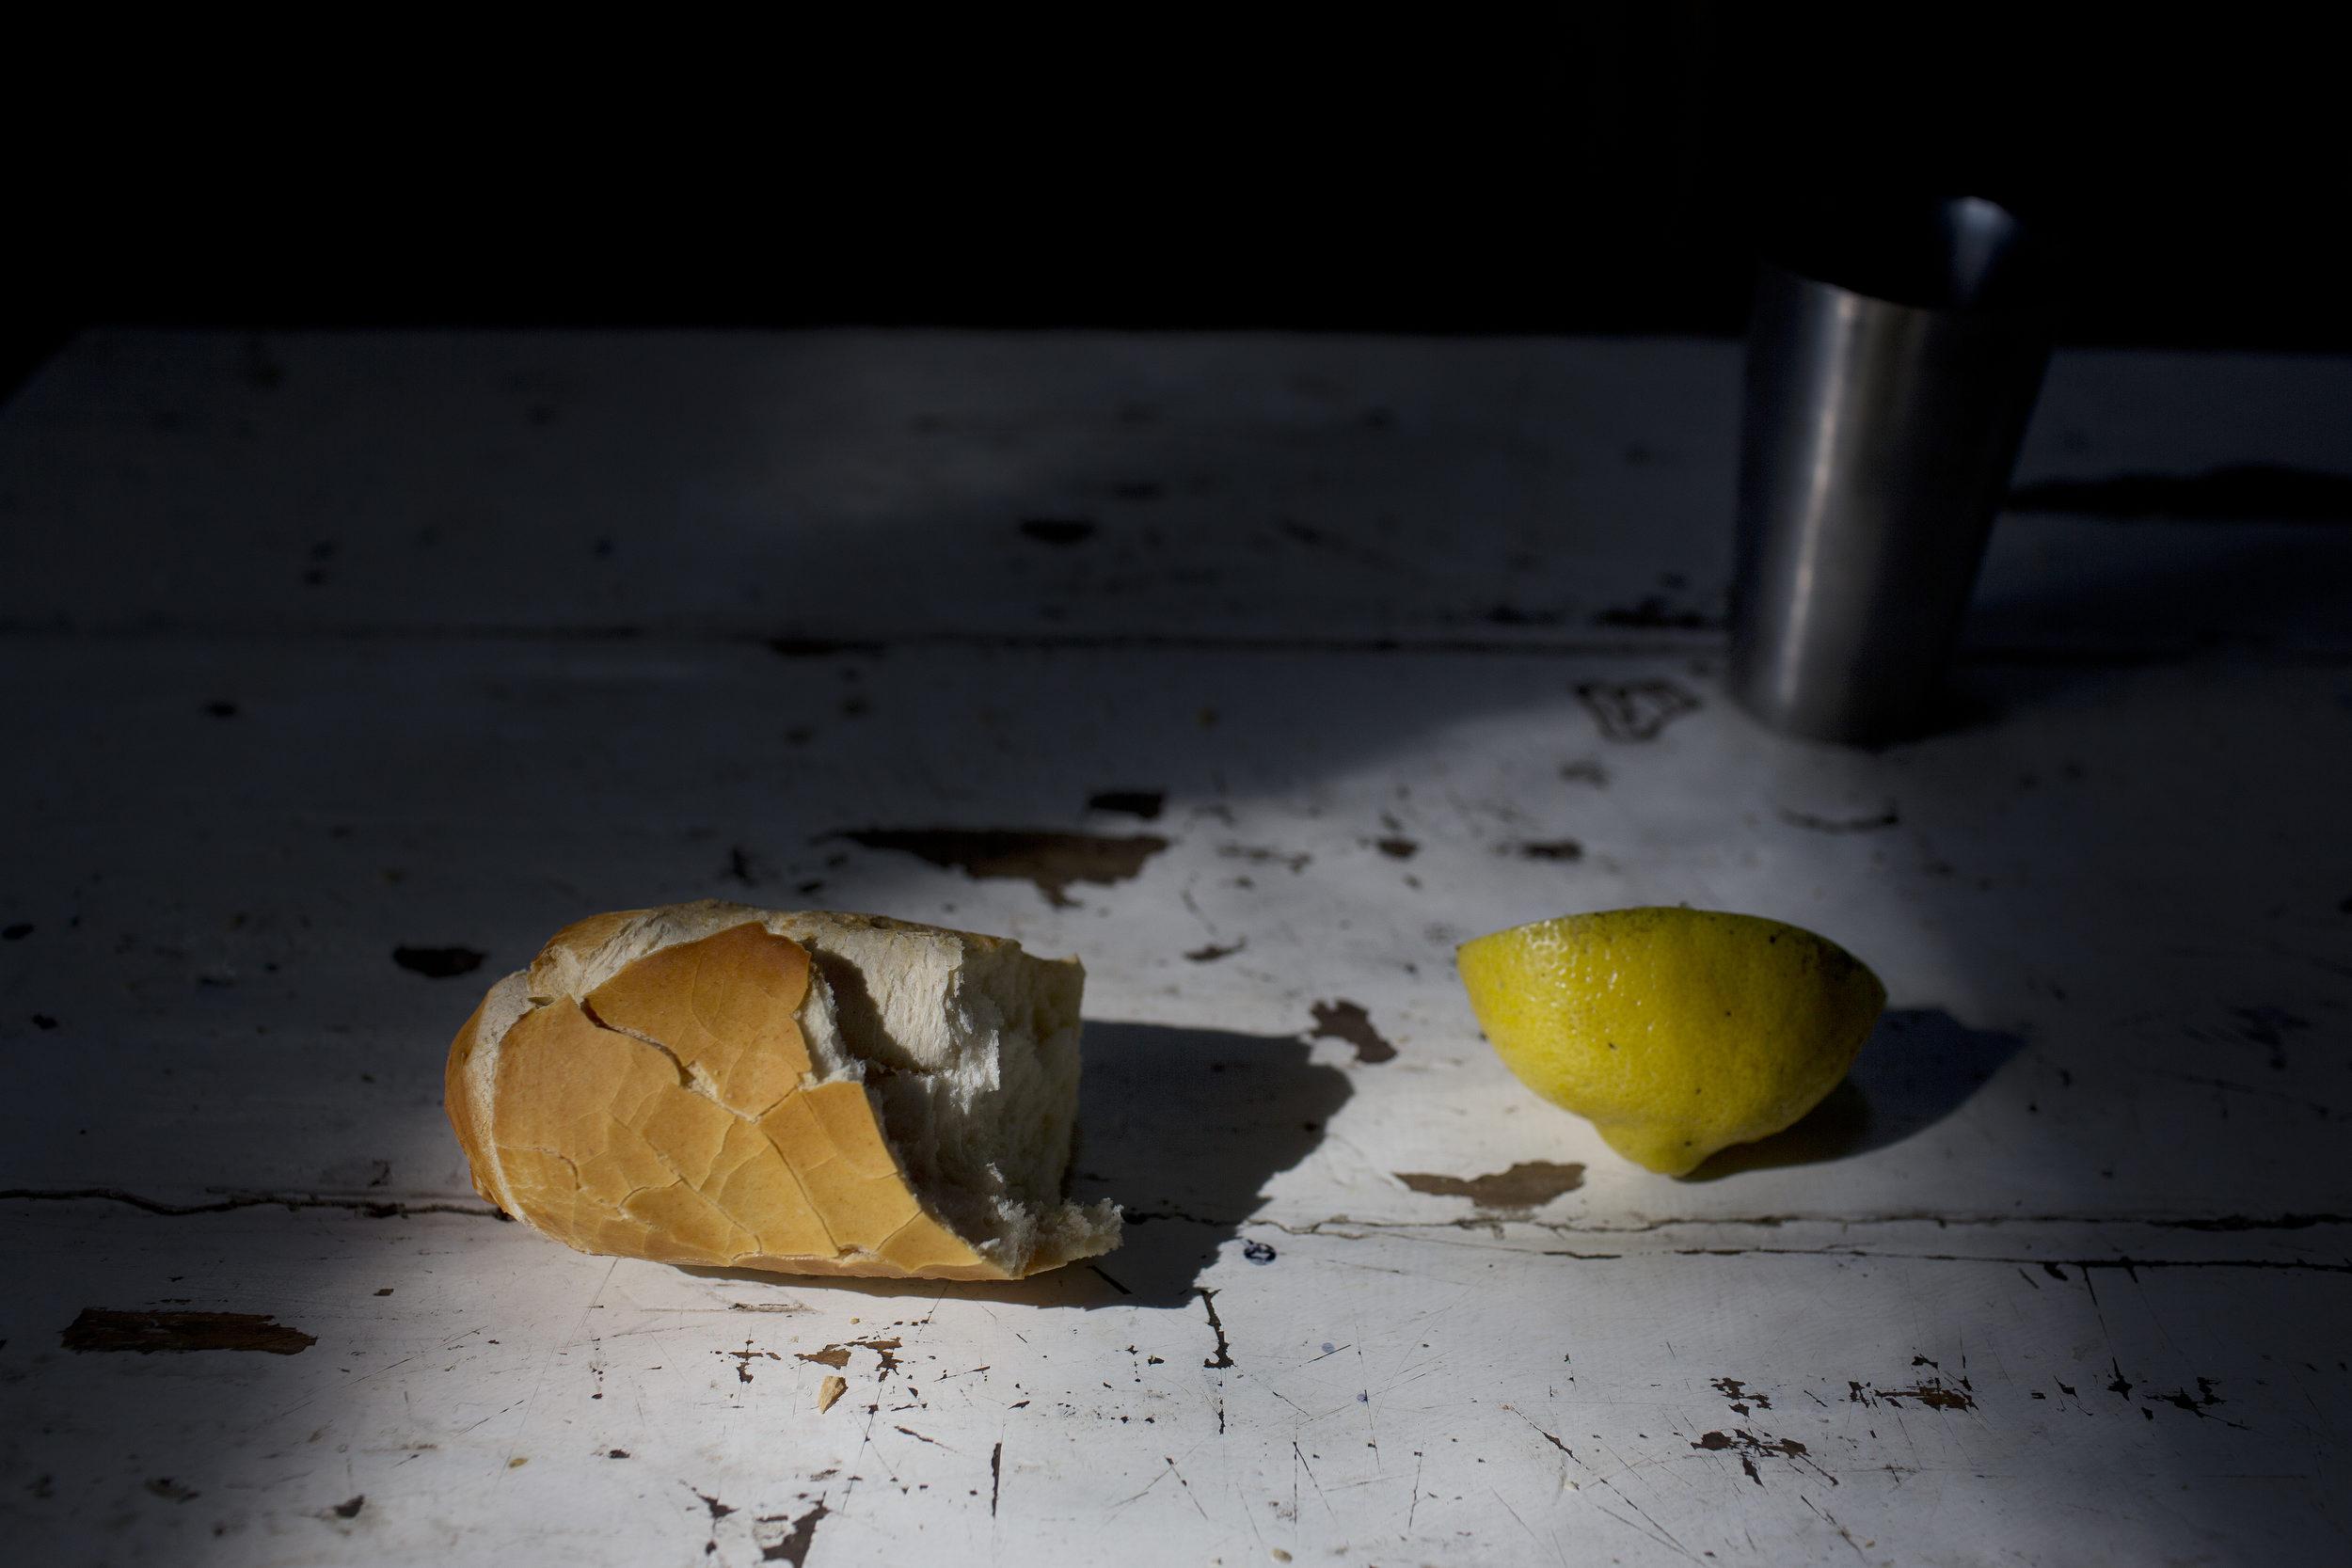 Bread and lemon.